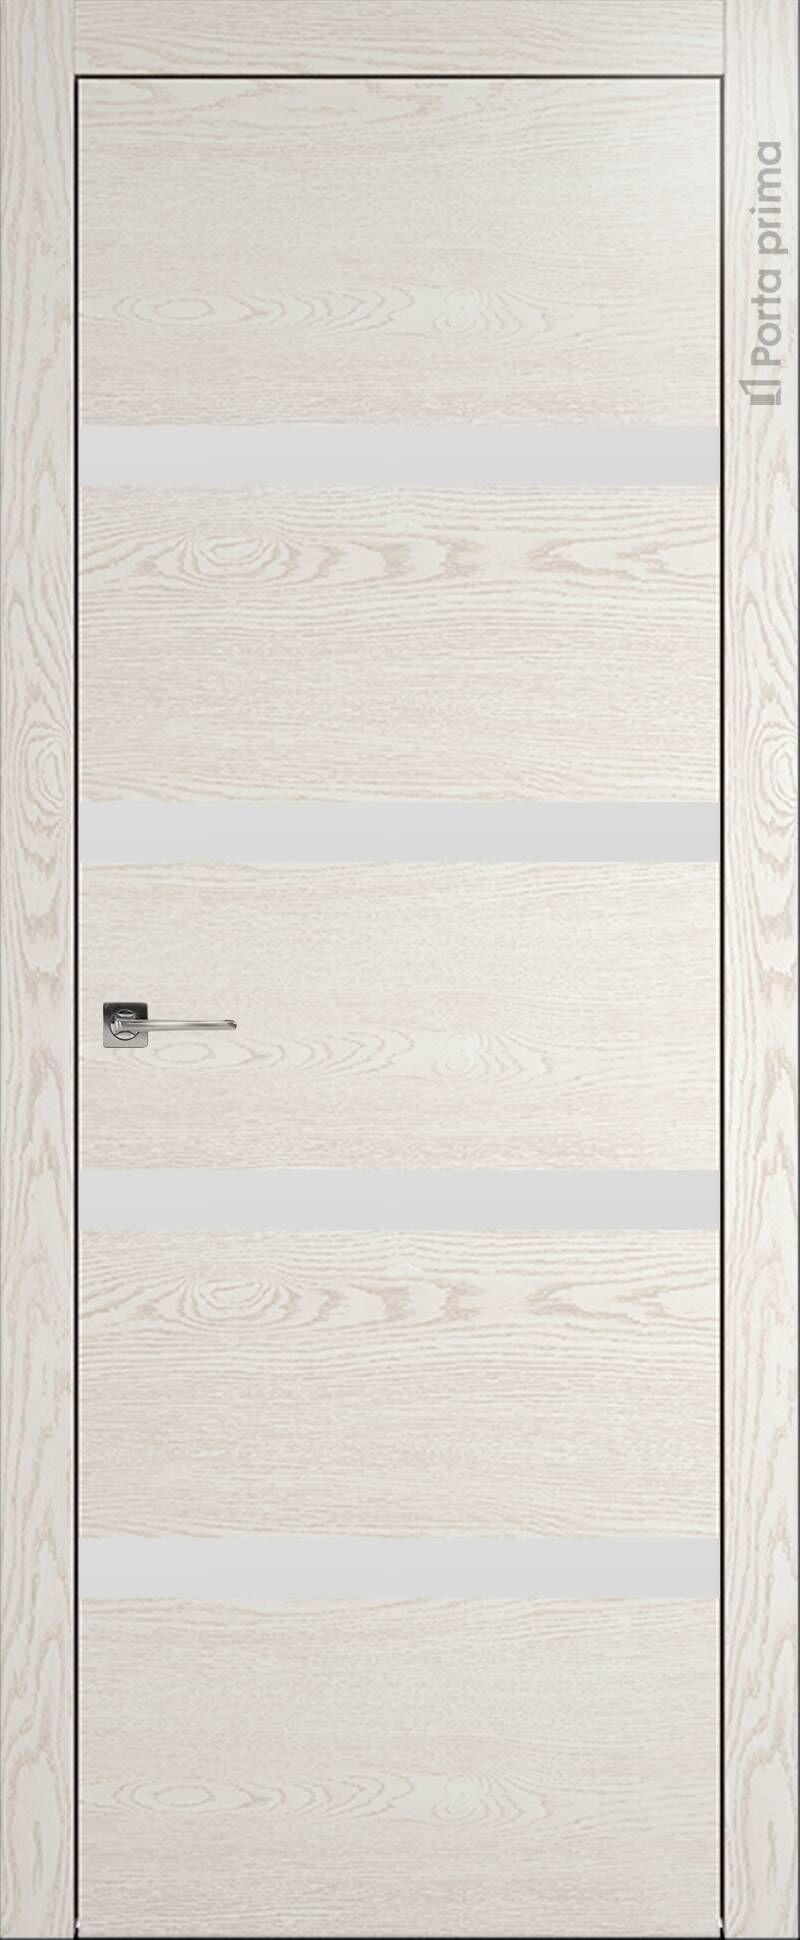 Tivoli Д-4 цвет - Белый ясень (nano-flex) Без стекла (ДГ)